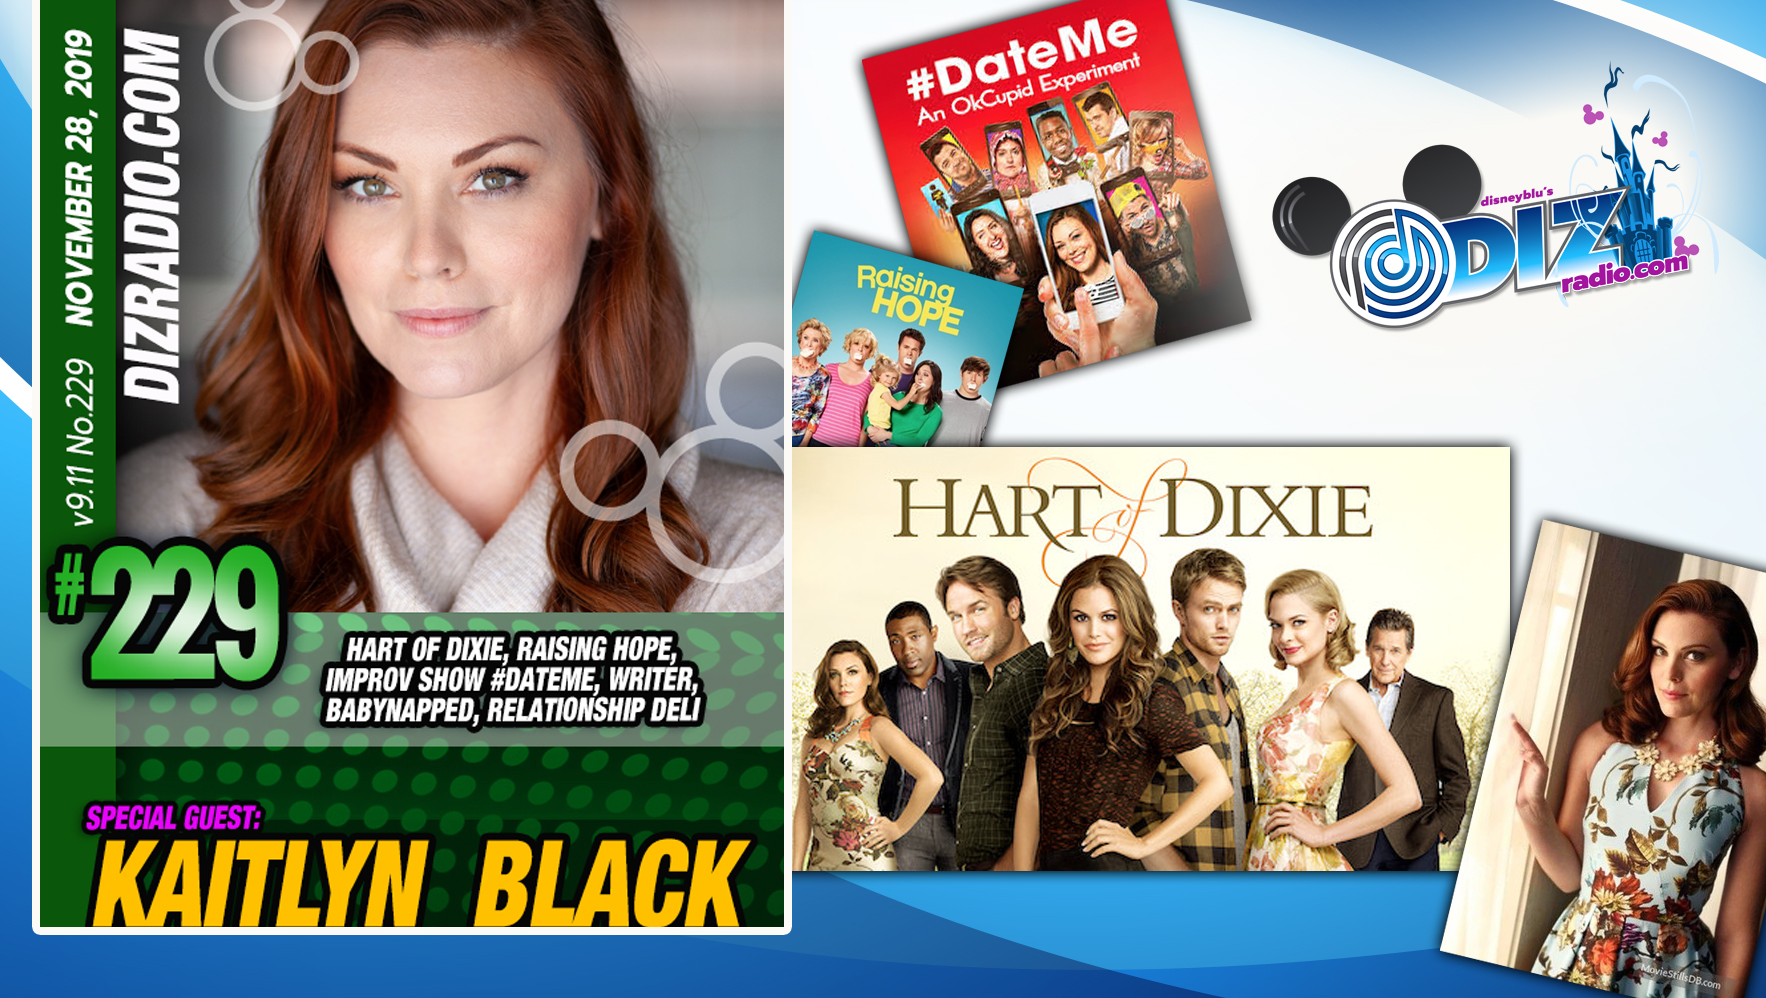 DisneyBlu's DizRadio Disney on Demand Show #229 w/Special Guest KAITLYN BLACK (Hart of Dixie, Raising Hope, Improv Show #DateMe, Writer, Babynapped, Relationship Deli)